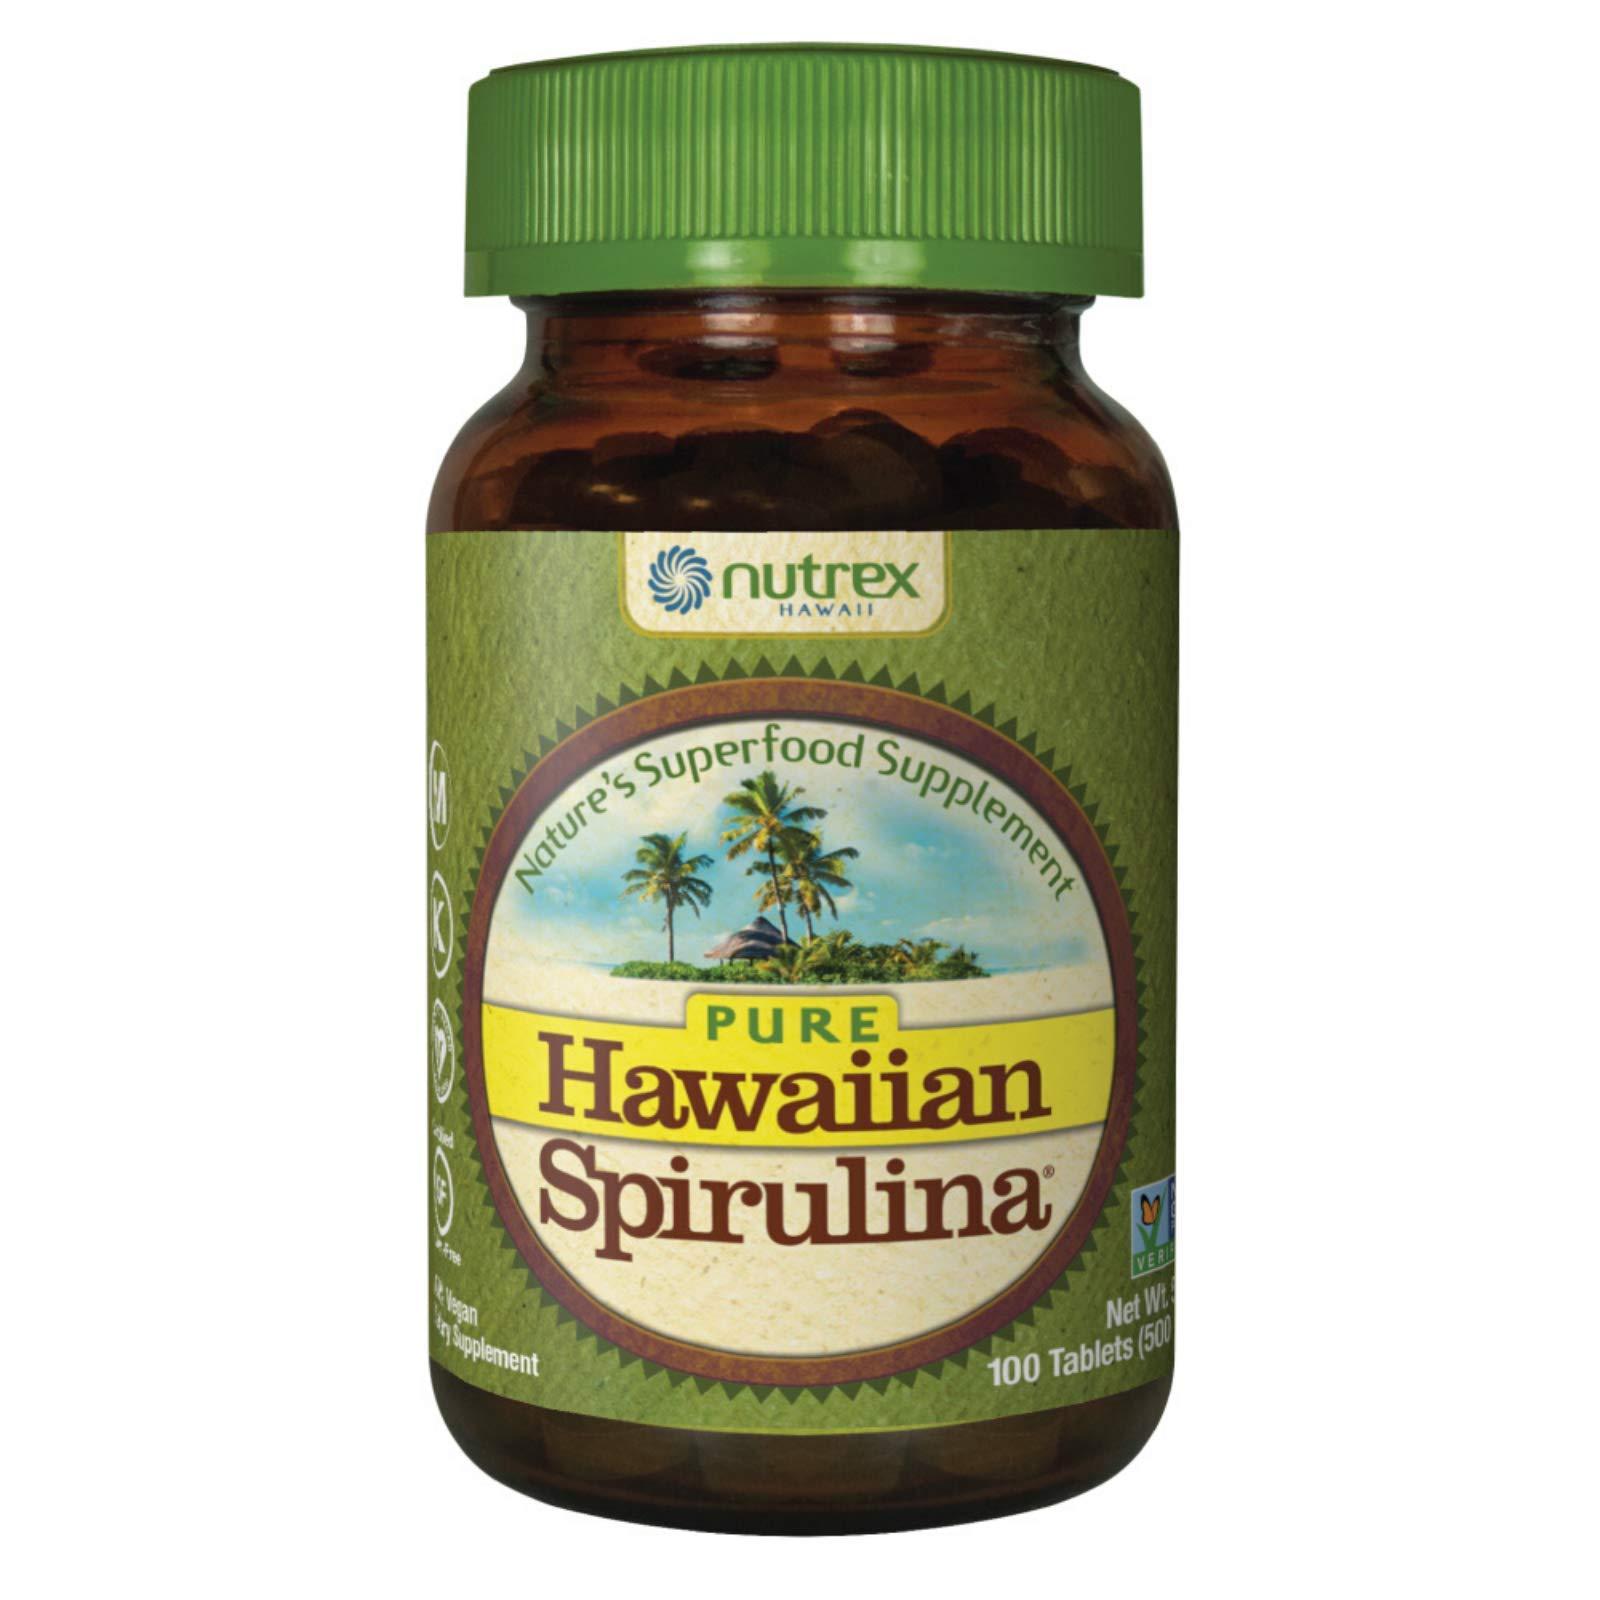 Pure Hawaiian Spirulina-500 mg Tablets 100 Count - Natural Premium Spirulina from Hawaii - Vegan, Non-GMO, Non-Irradiated - Superfood Supplement & Natural Multivitamin